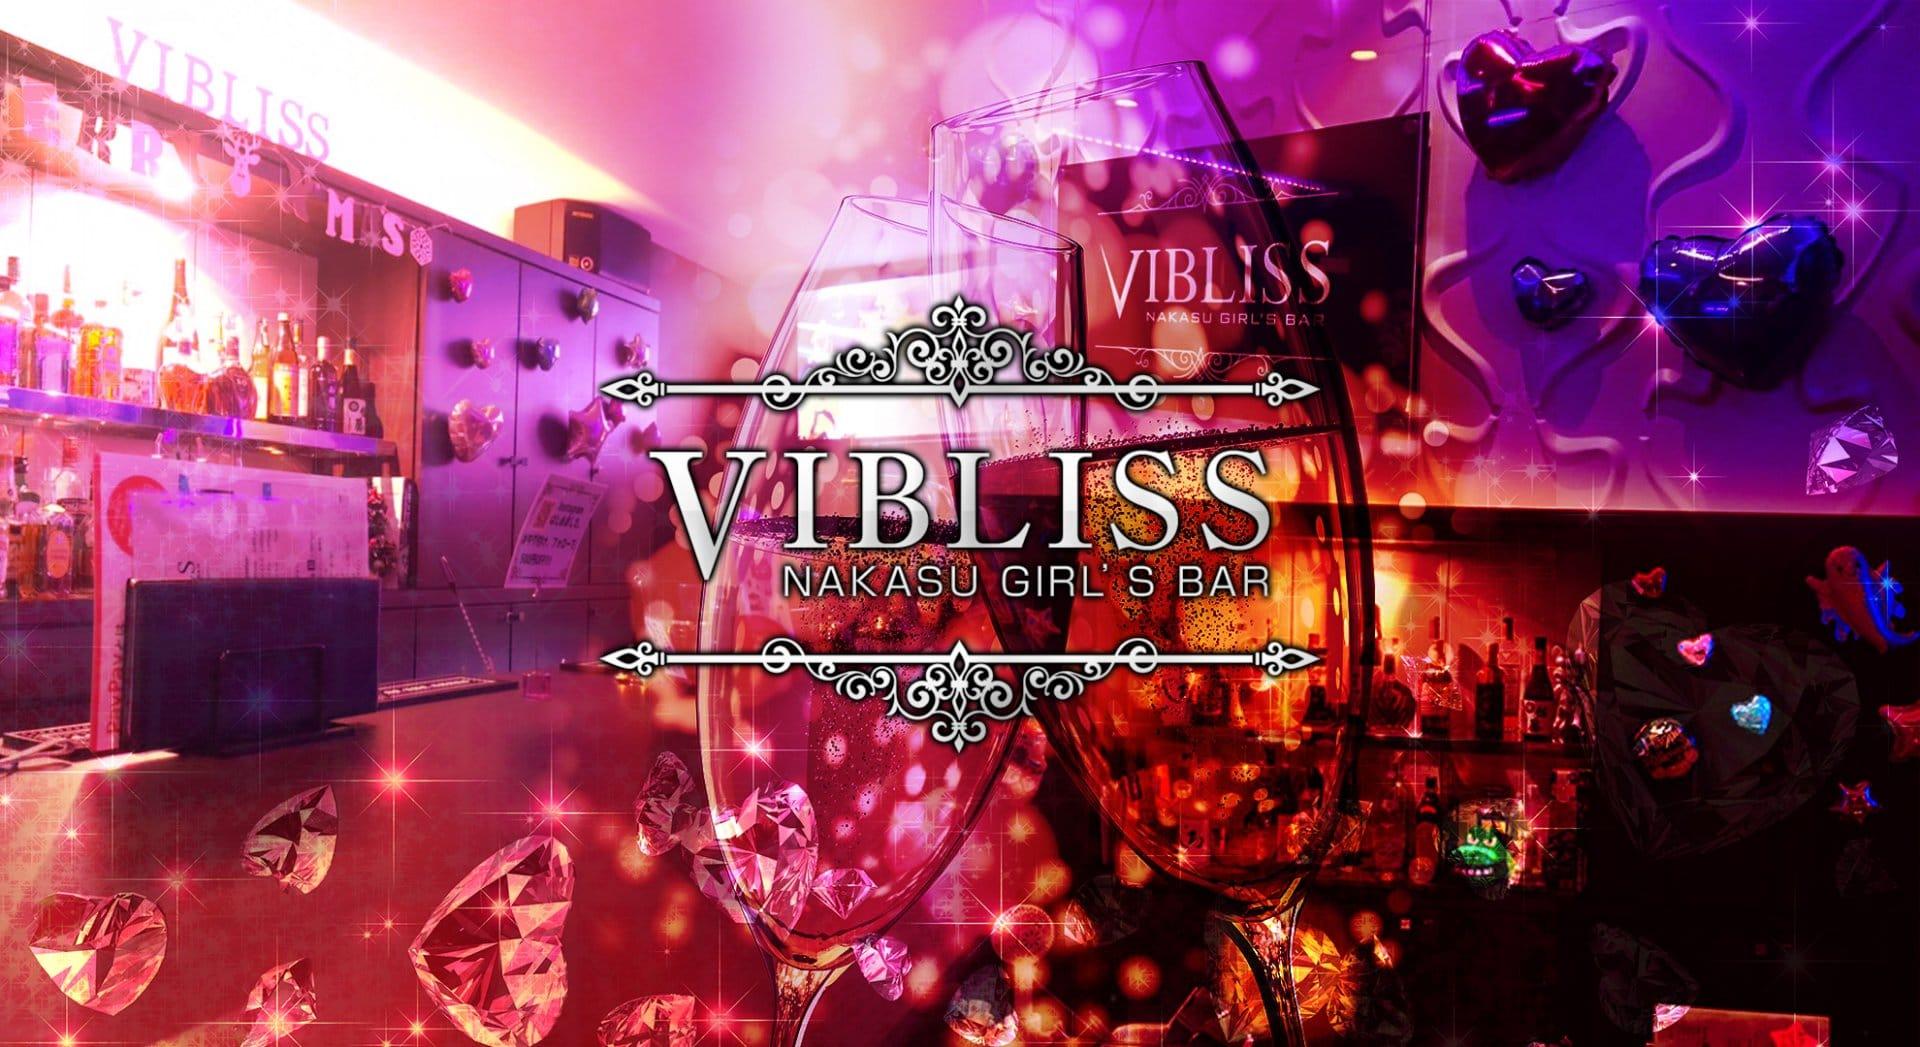 VIBLISS(ヴィブリス) 中洲ガールズバー TOP画像